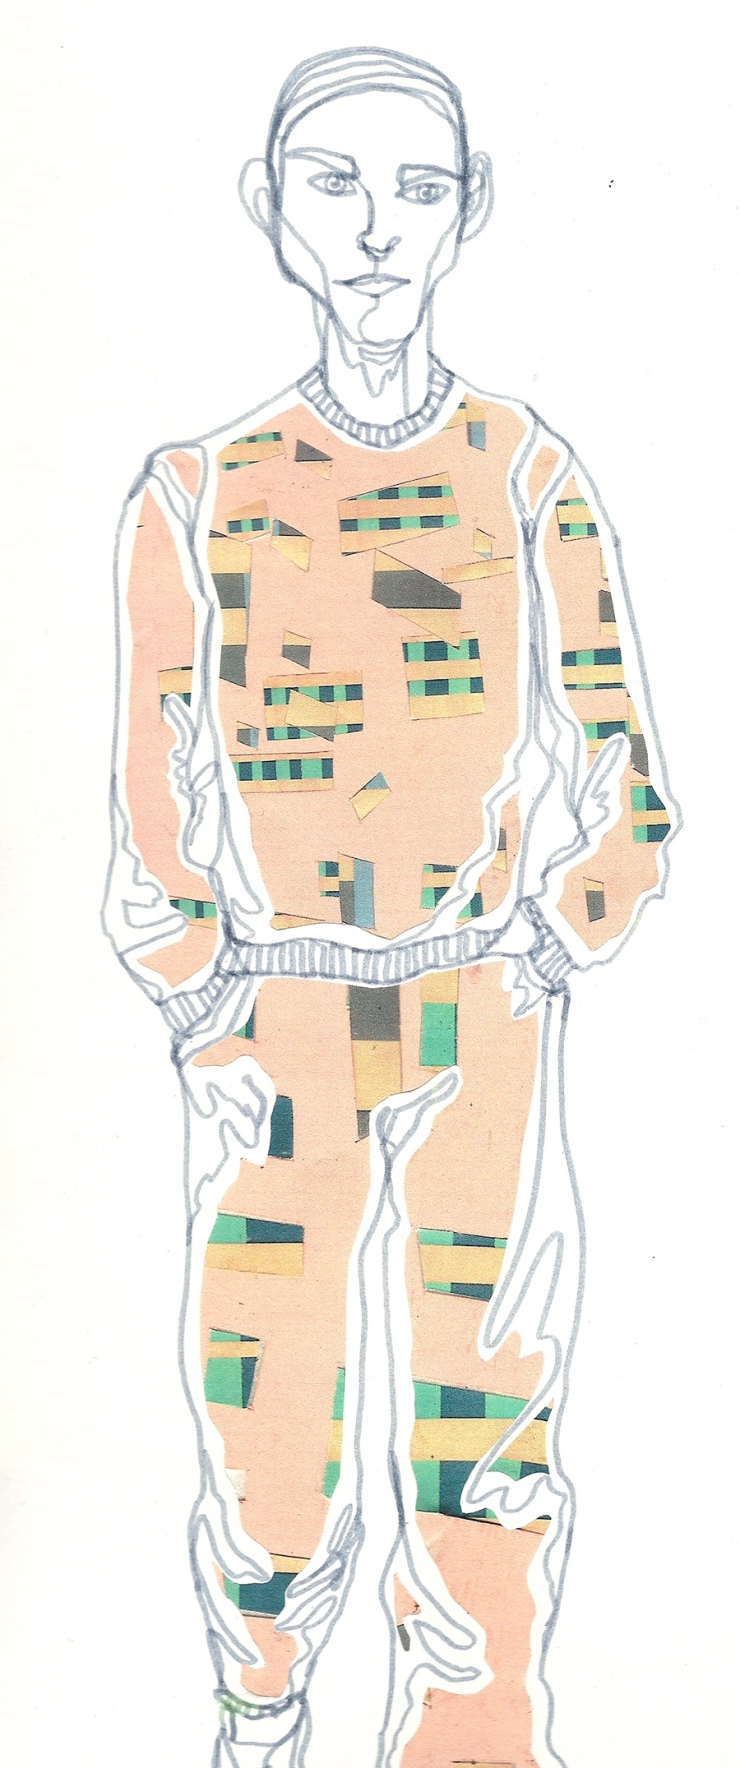 rosie-franklin-soapbox-press-visualisation-wsa-print-two